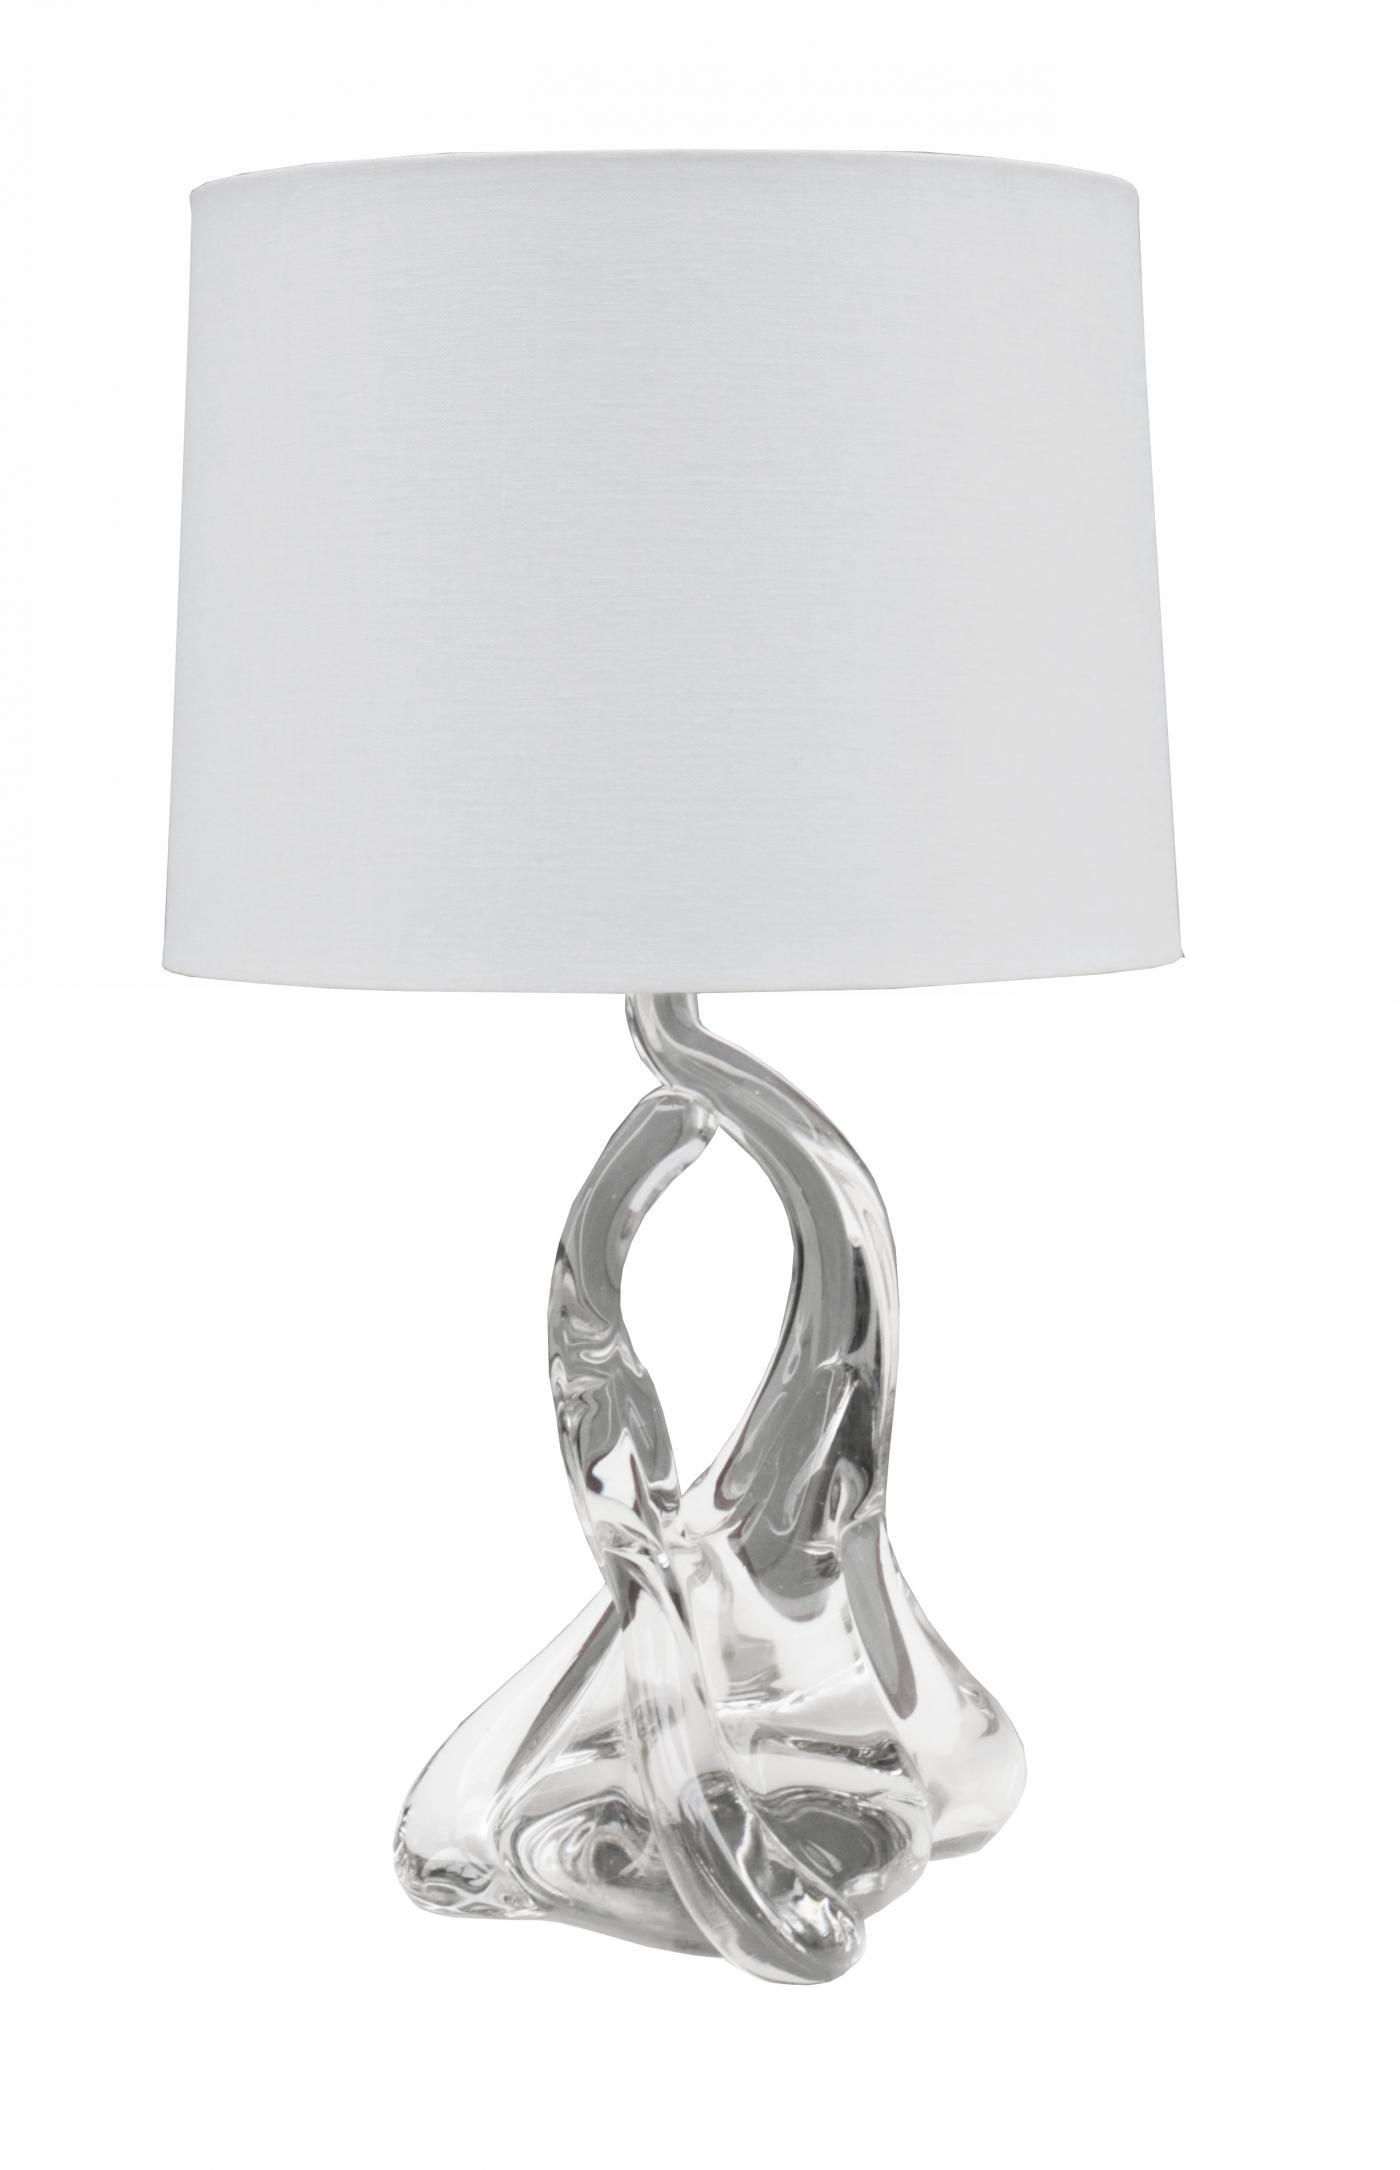 Pair of clear swivel glass lamps manufacturer Val Saint Lambert